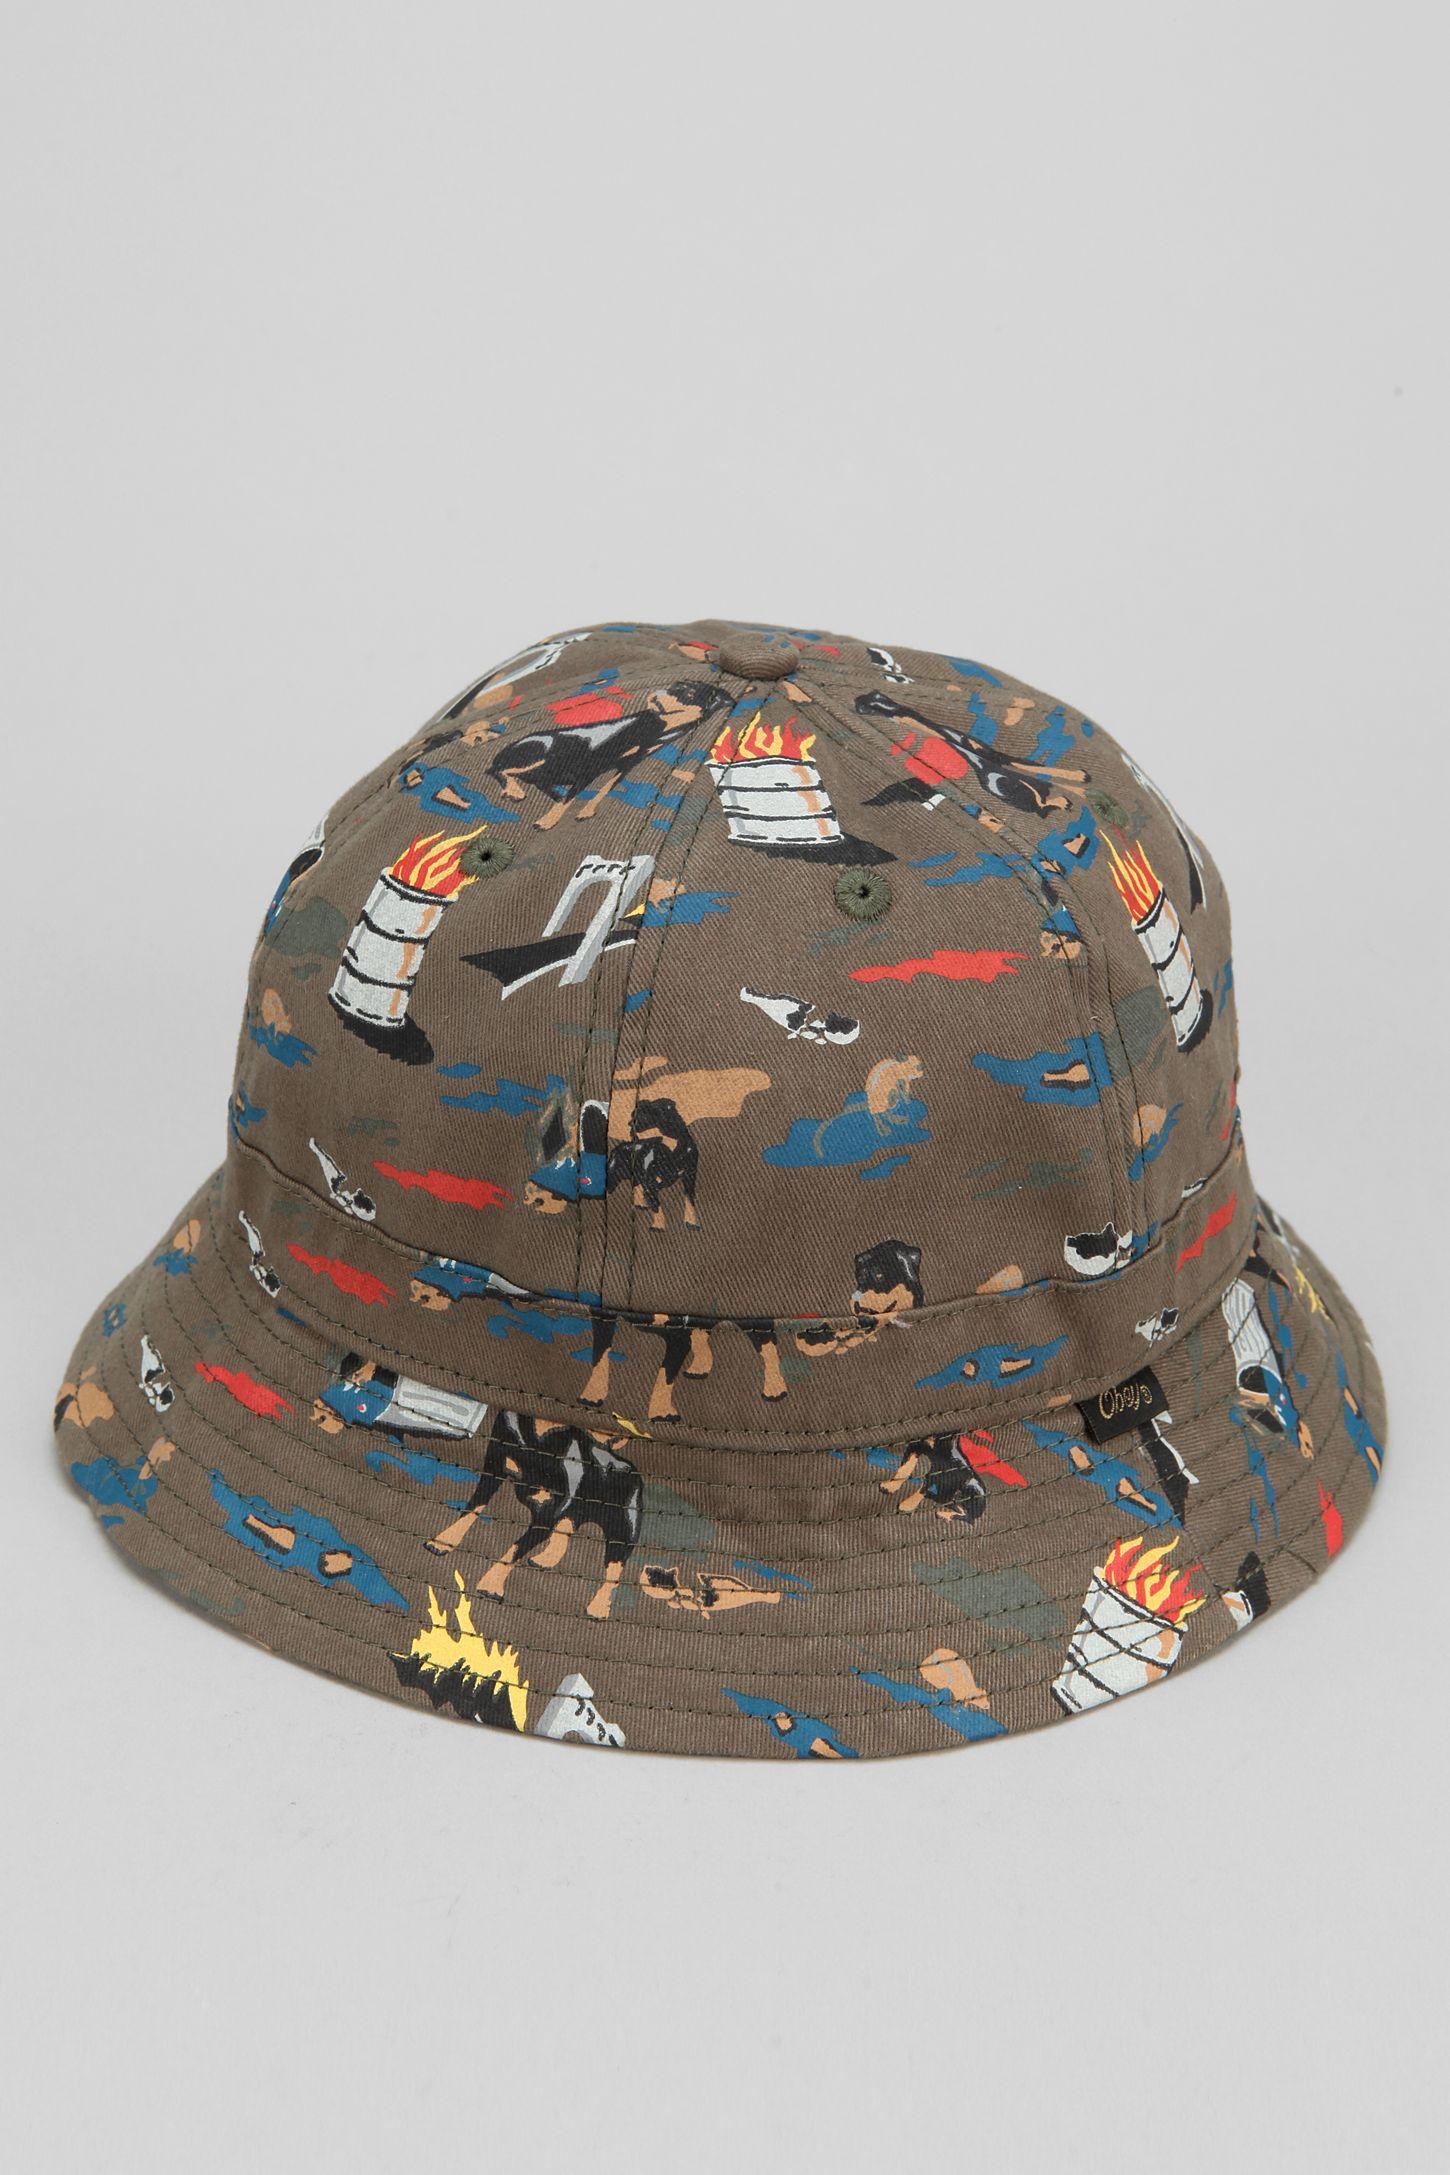 700b9cd3f54d8 OBEY City Hunting Bucket Hat